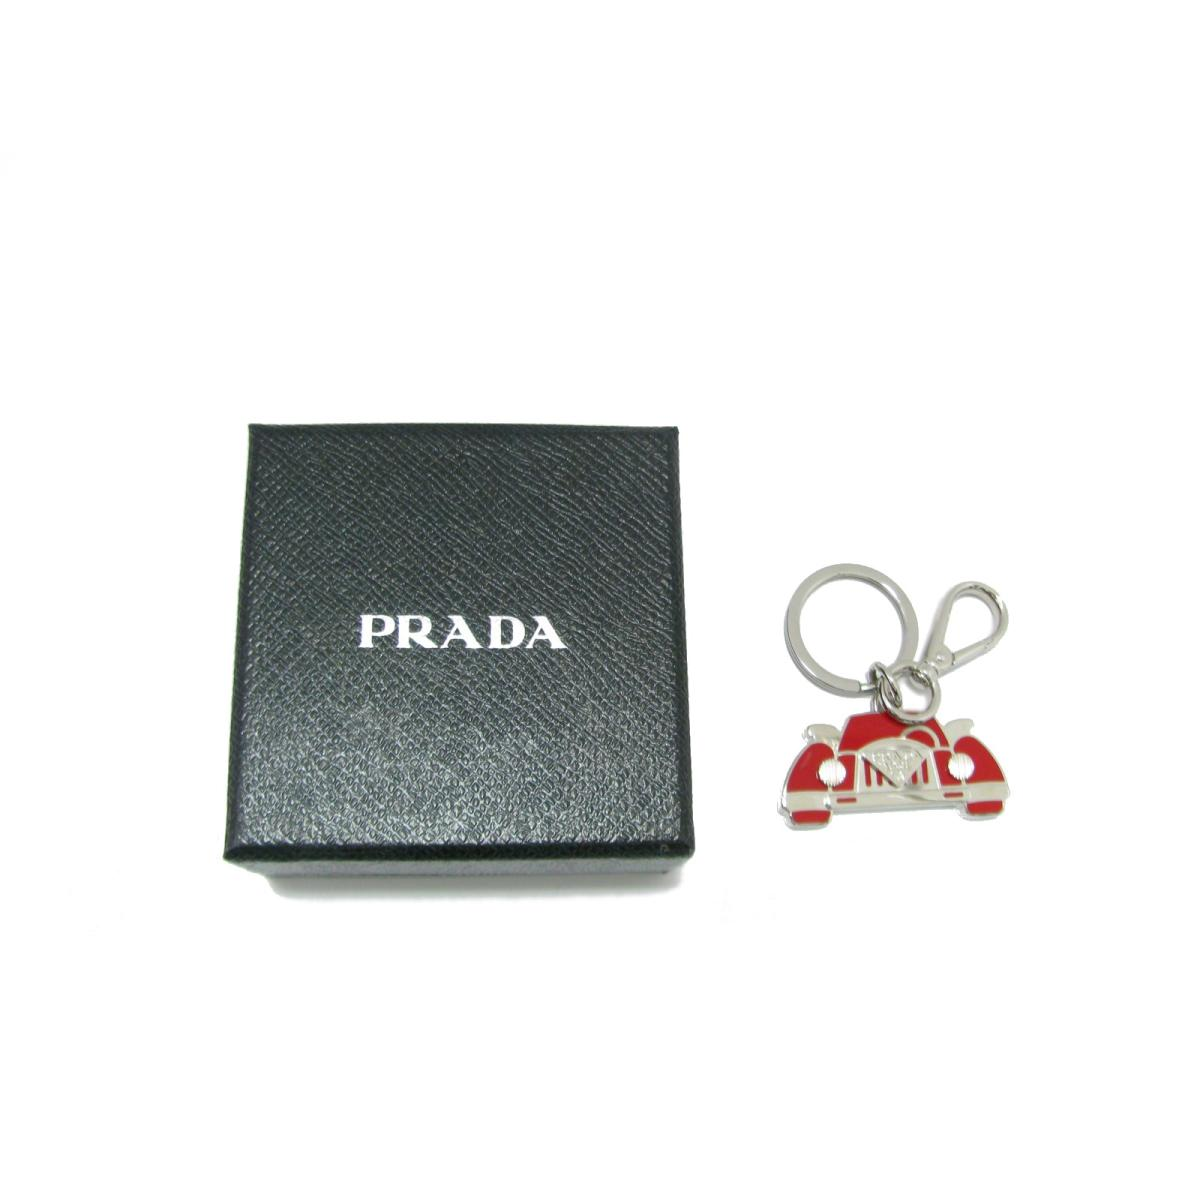 45aef37ad7c2 Prada key ring key ring car motif men gap Dis metal x red   PRADA key ring  key ring car motif beauty product brand off BRANDOFF